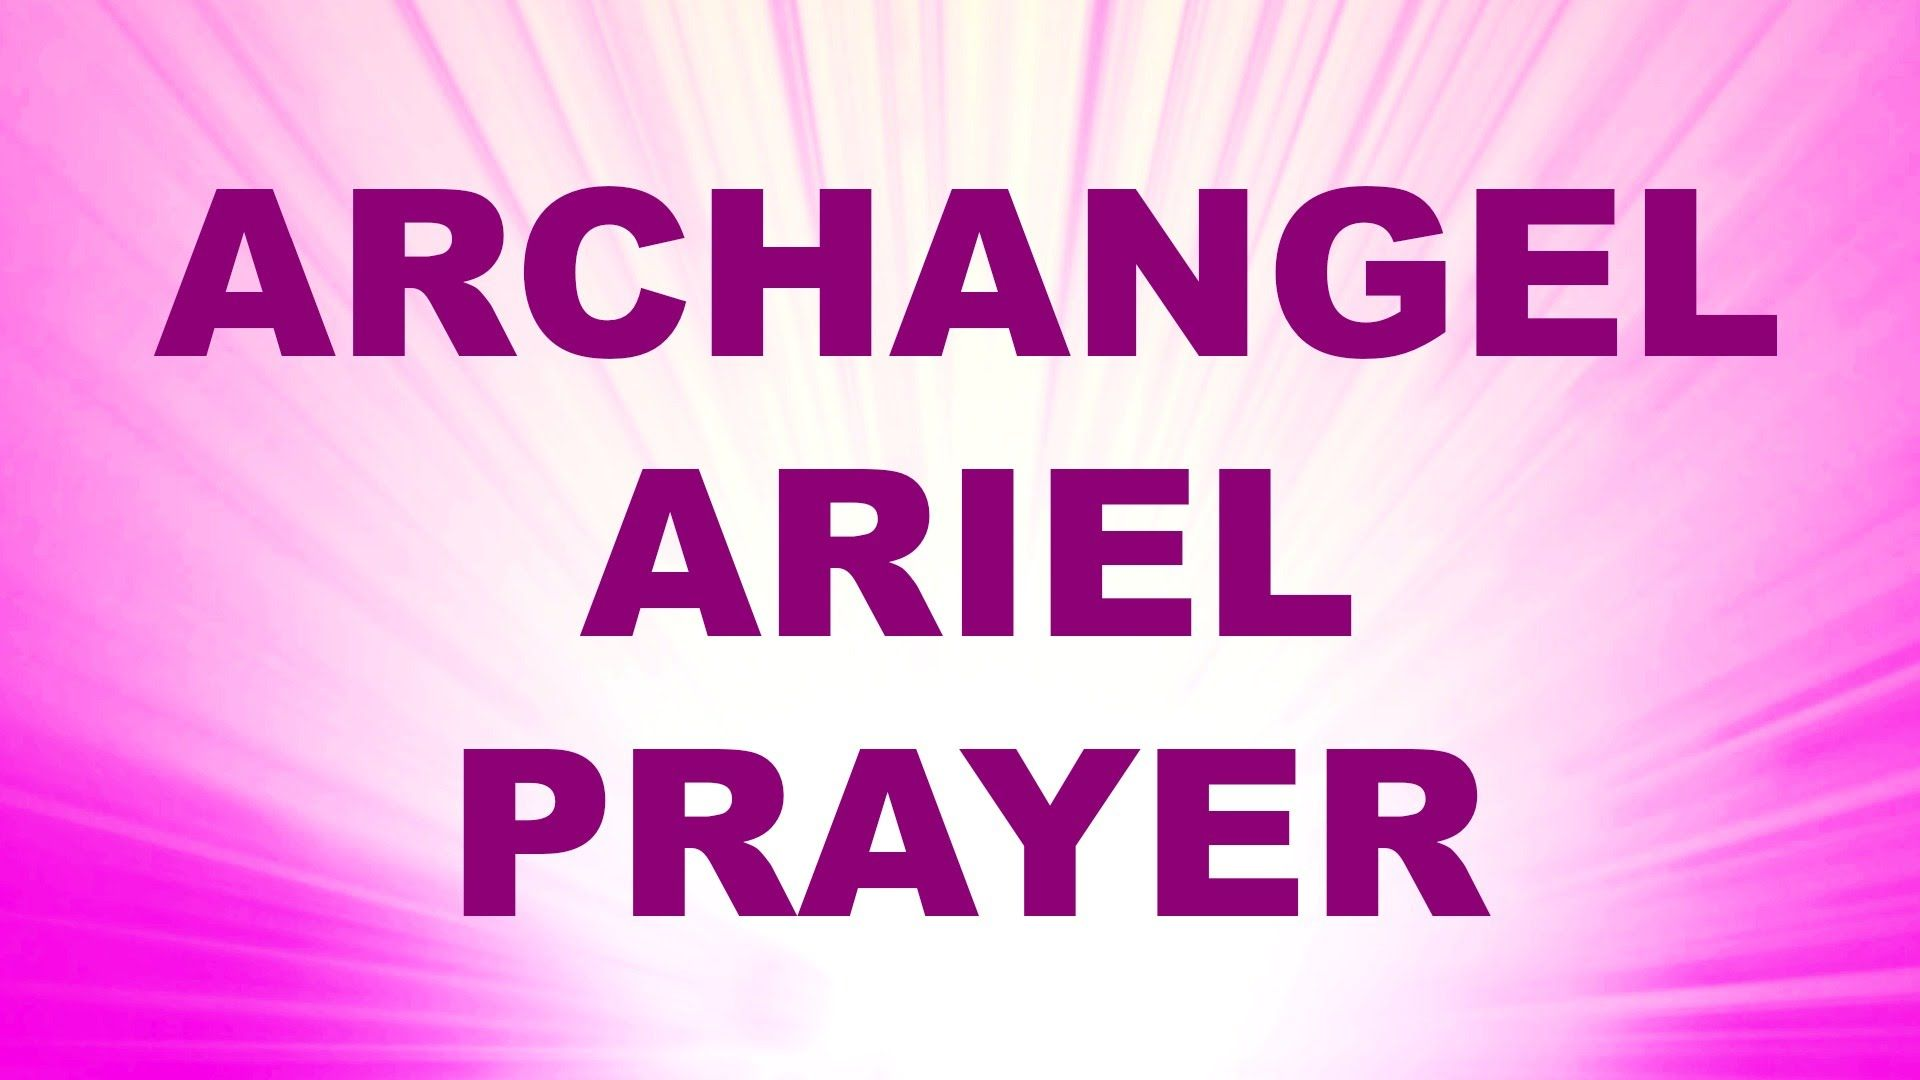 Angel Prayer for Prosperity and Abundance - Archangel Ariel